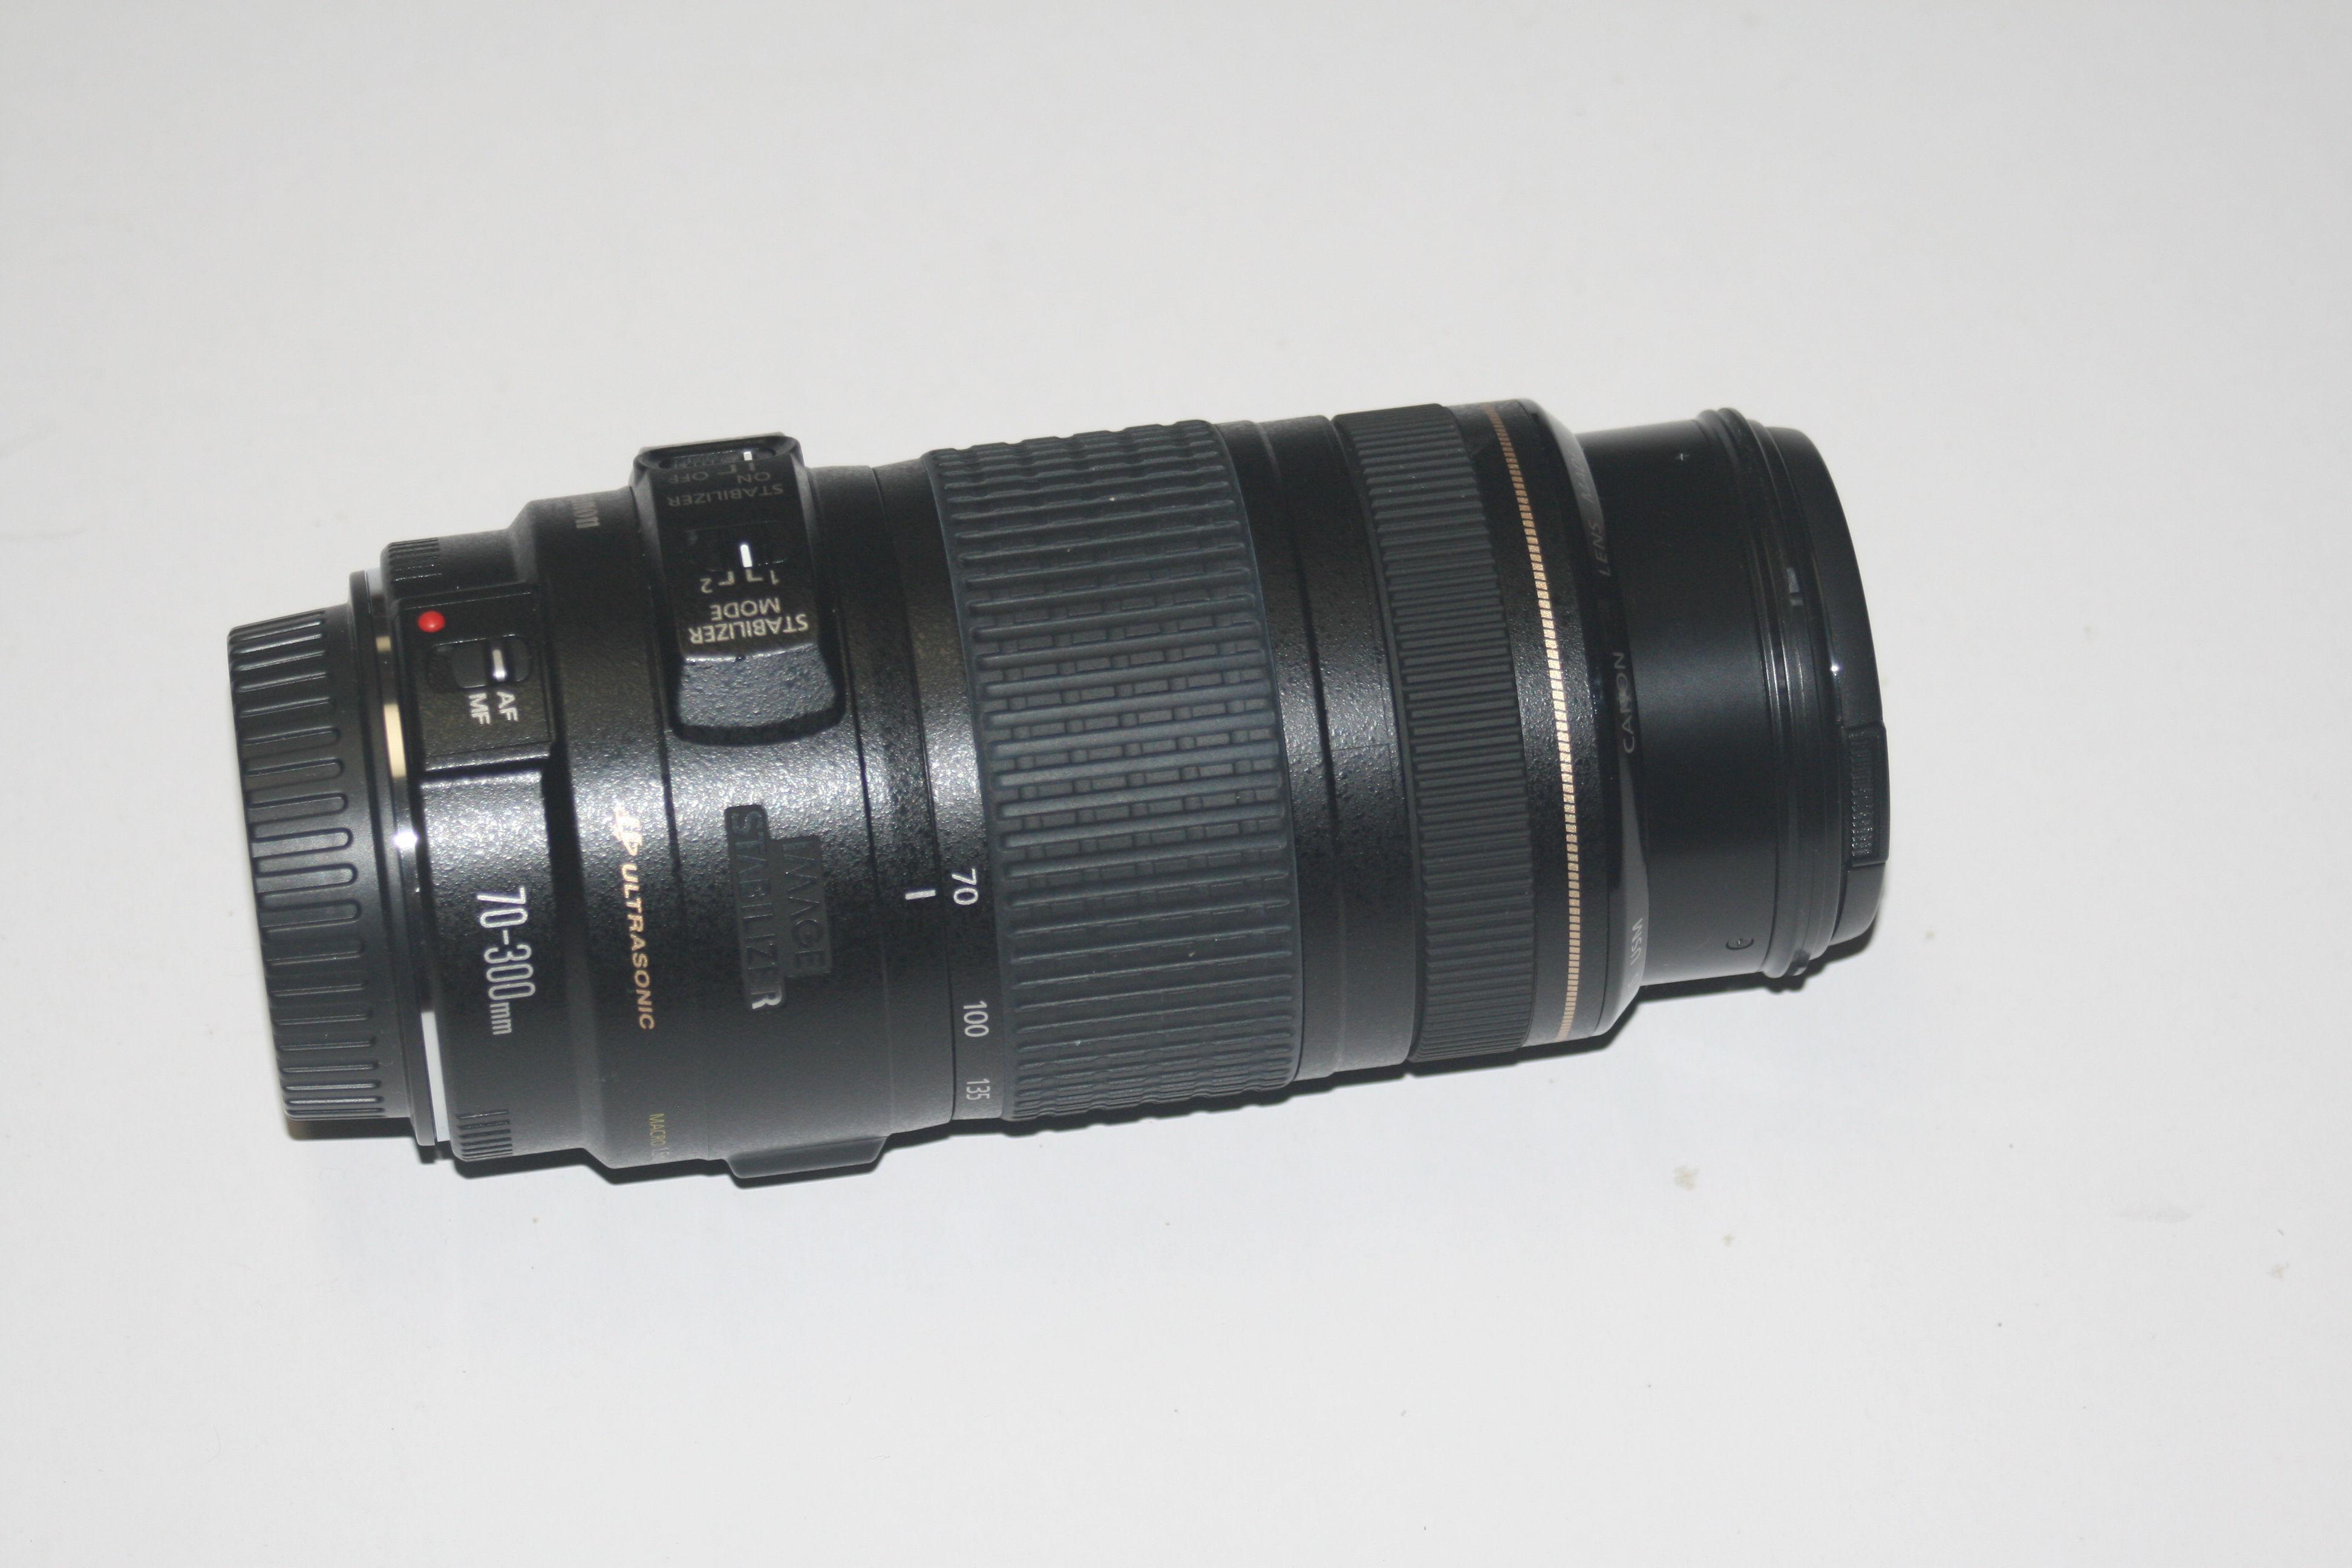 Canon Image stabilization 70-300 Lens image 1